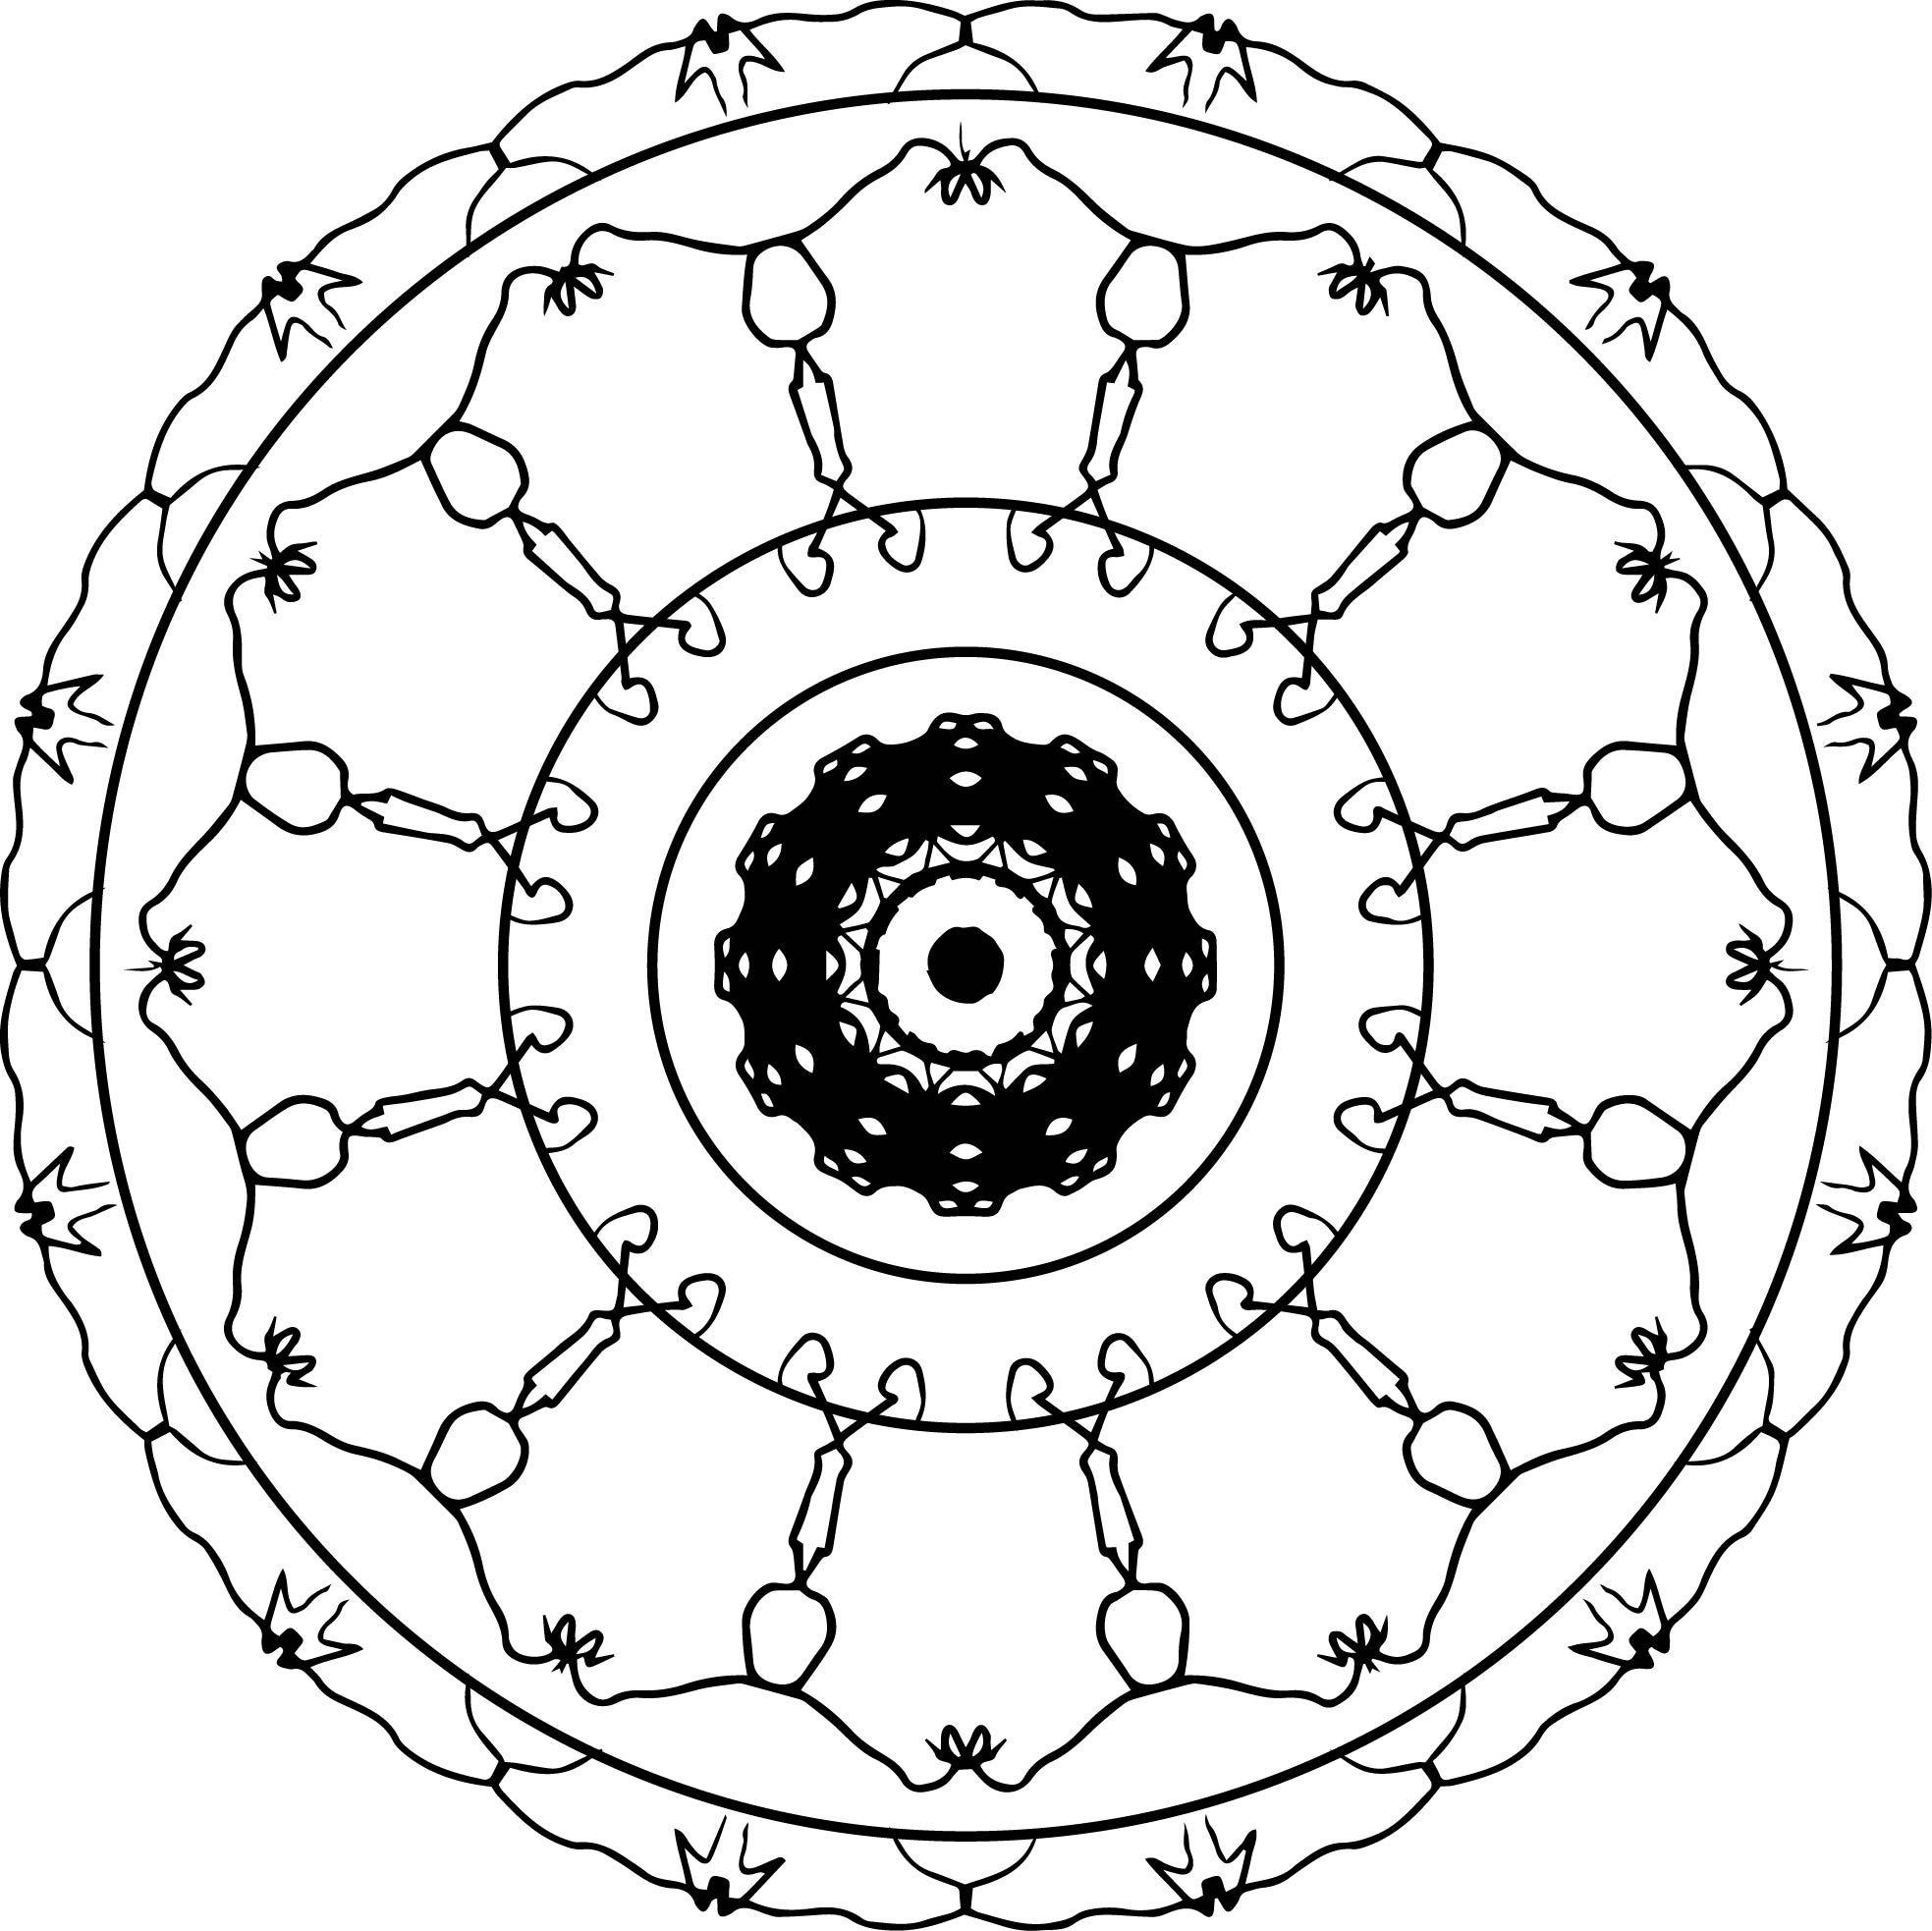 mandala coloring page 27 12 2015 014343 wecoloringpage